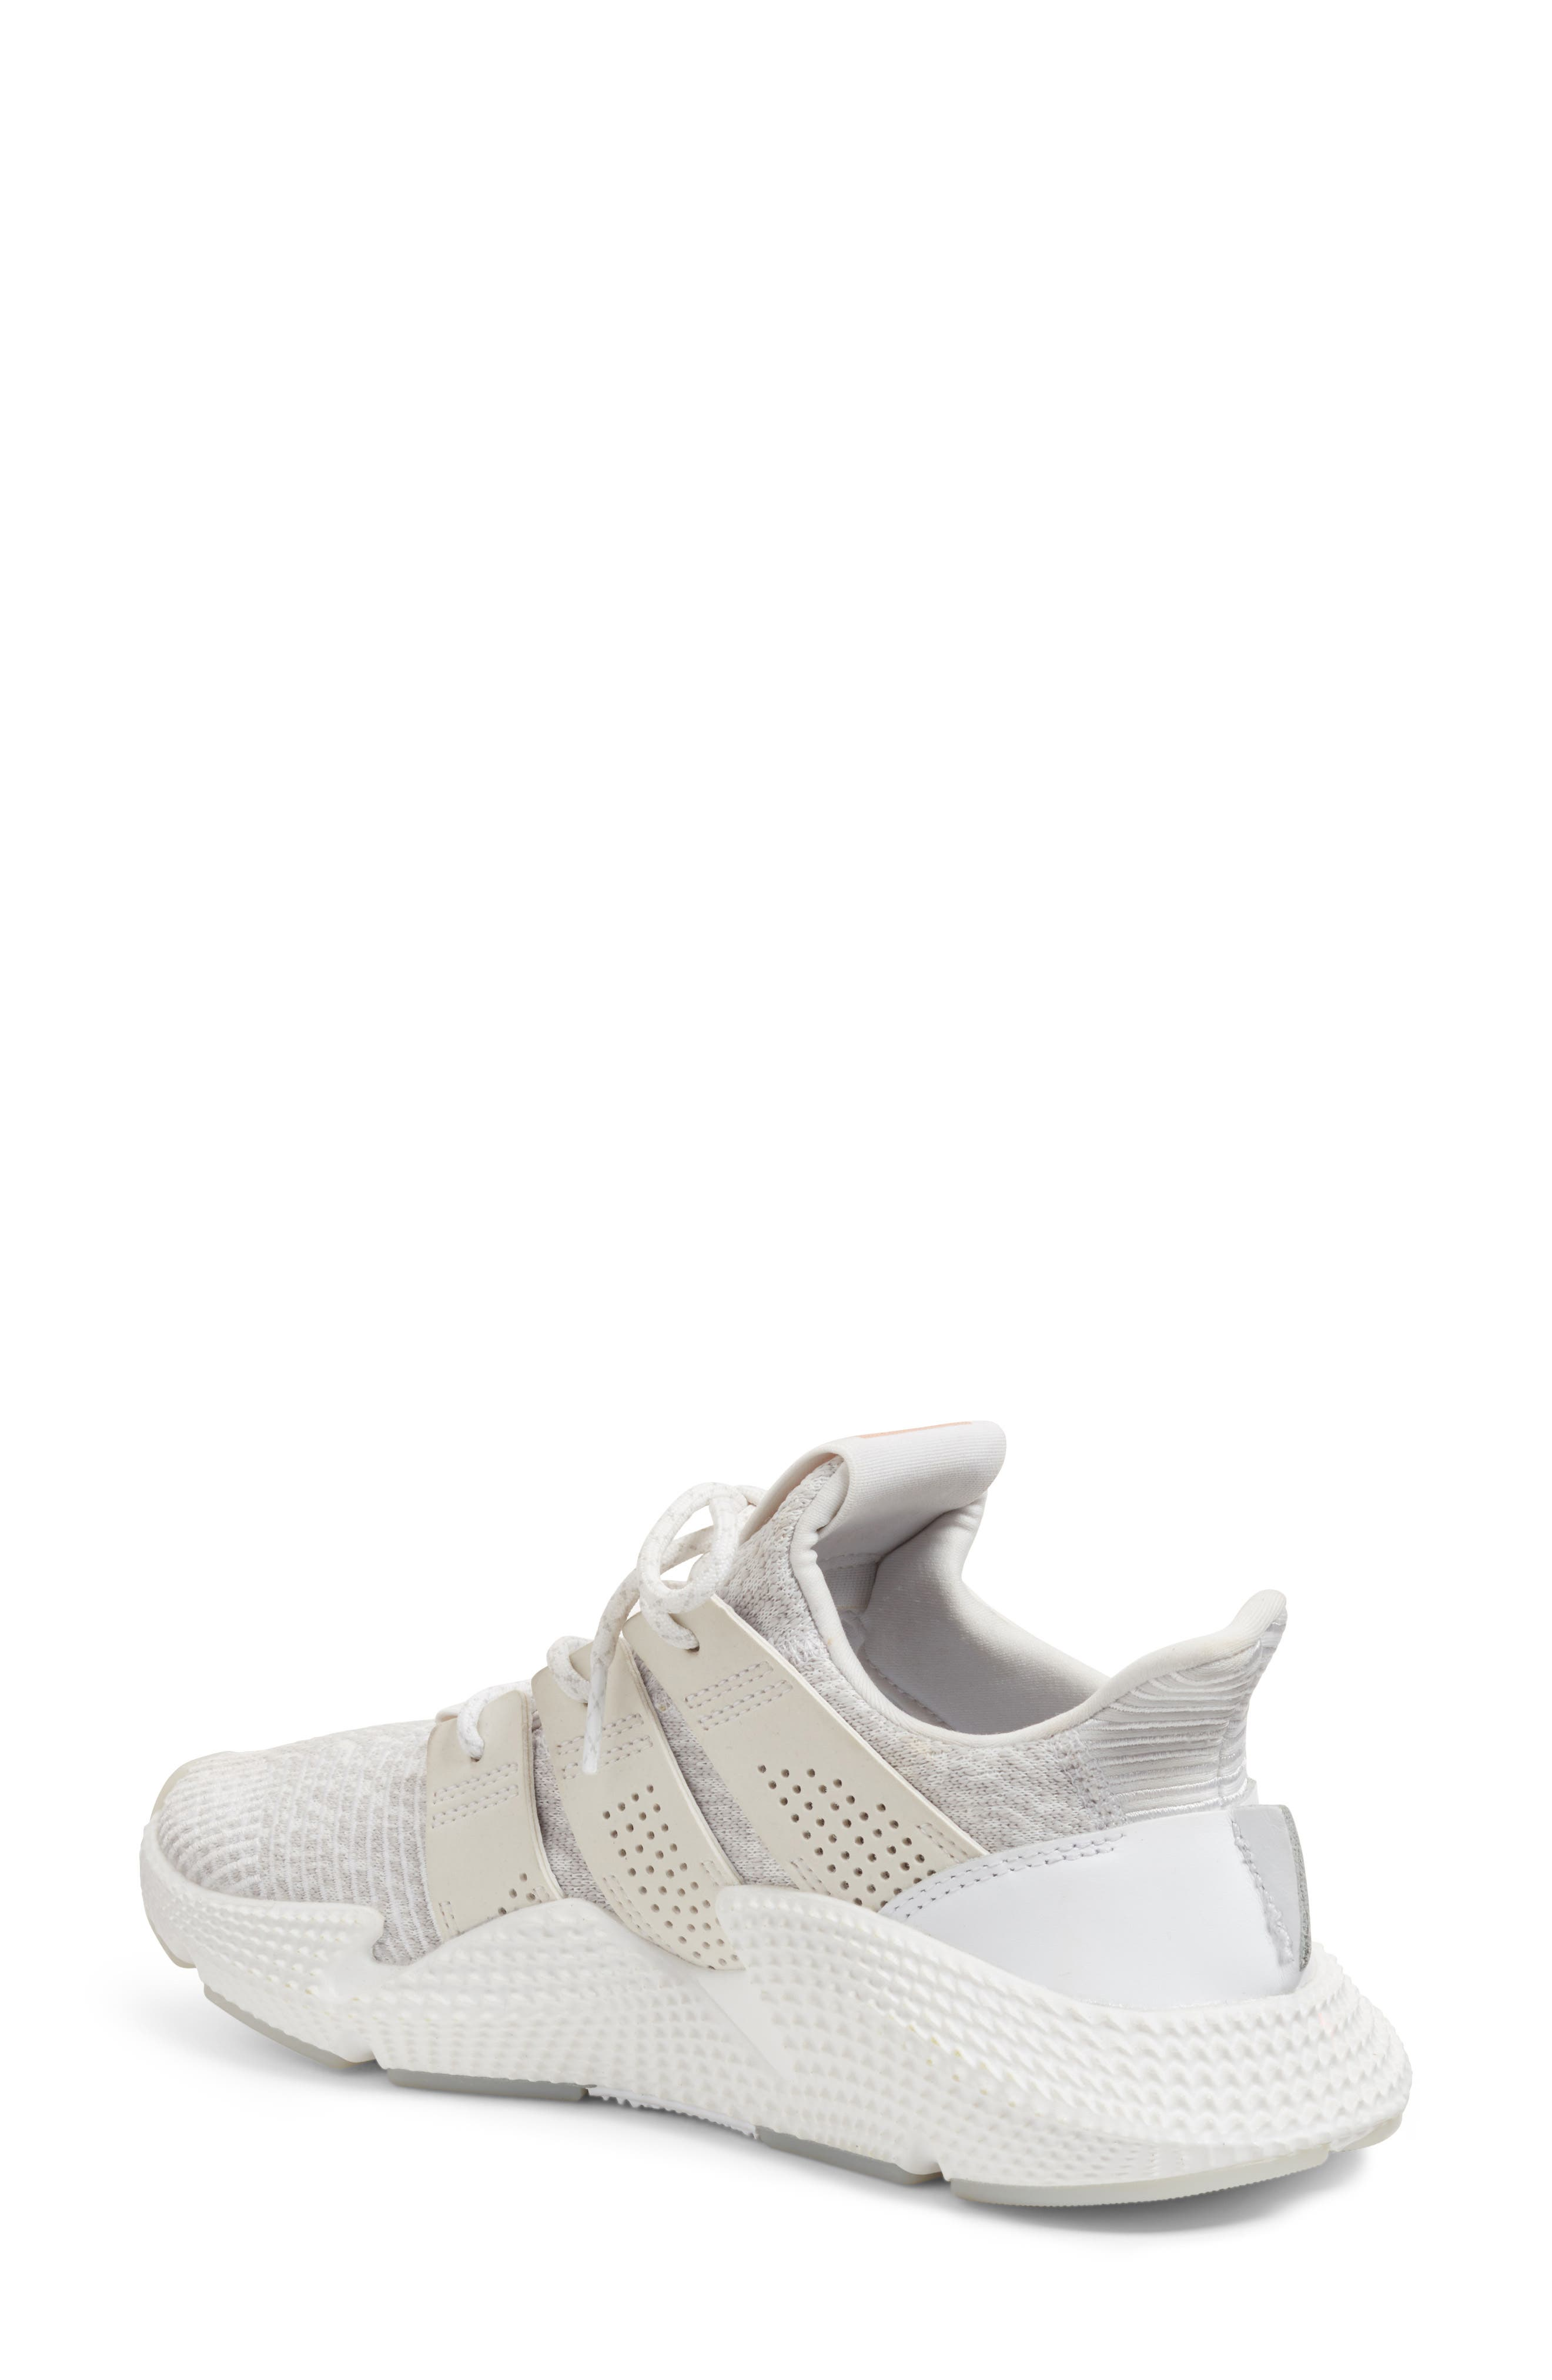 Prophere Sneaker,                             Alternate thumbnail 2, color,                             White/ White/ Supplier Colour